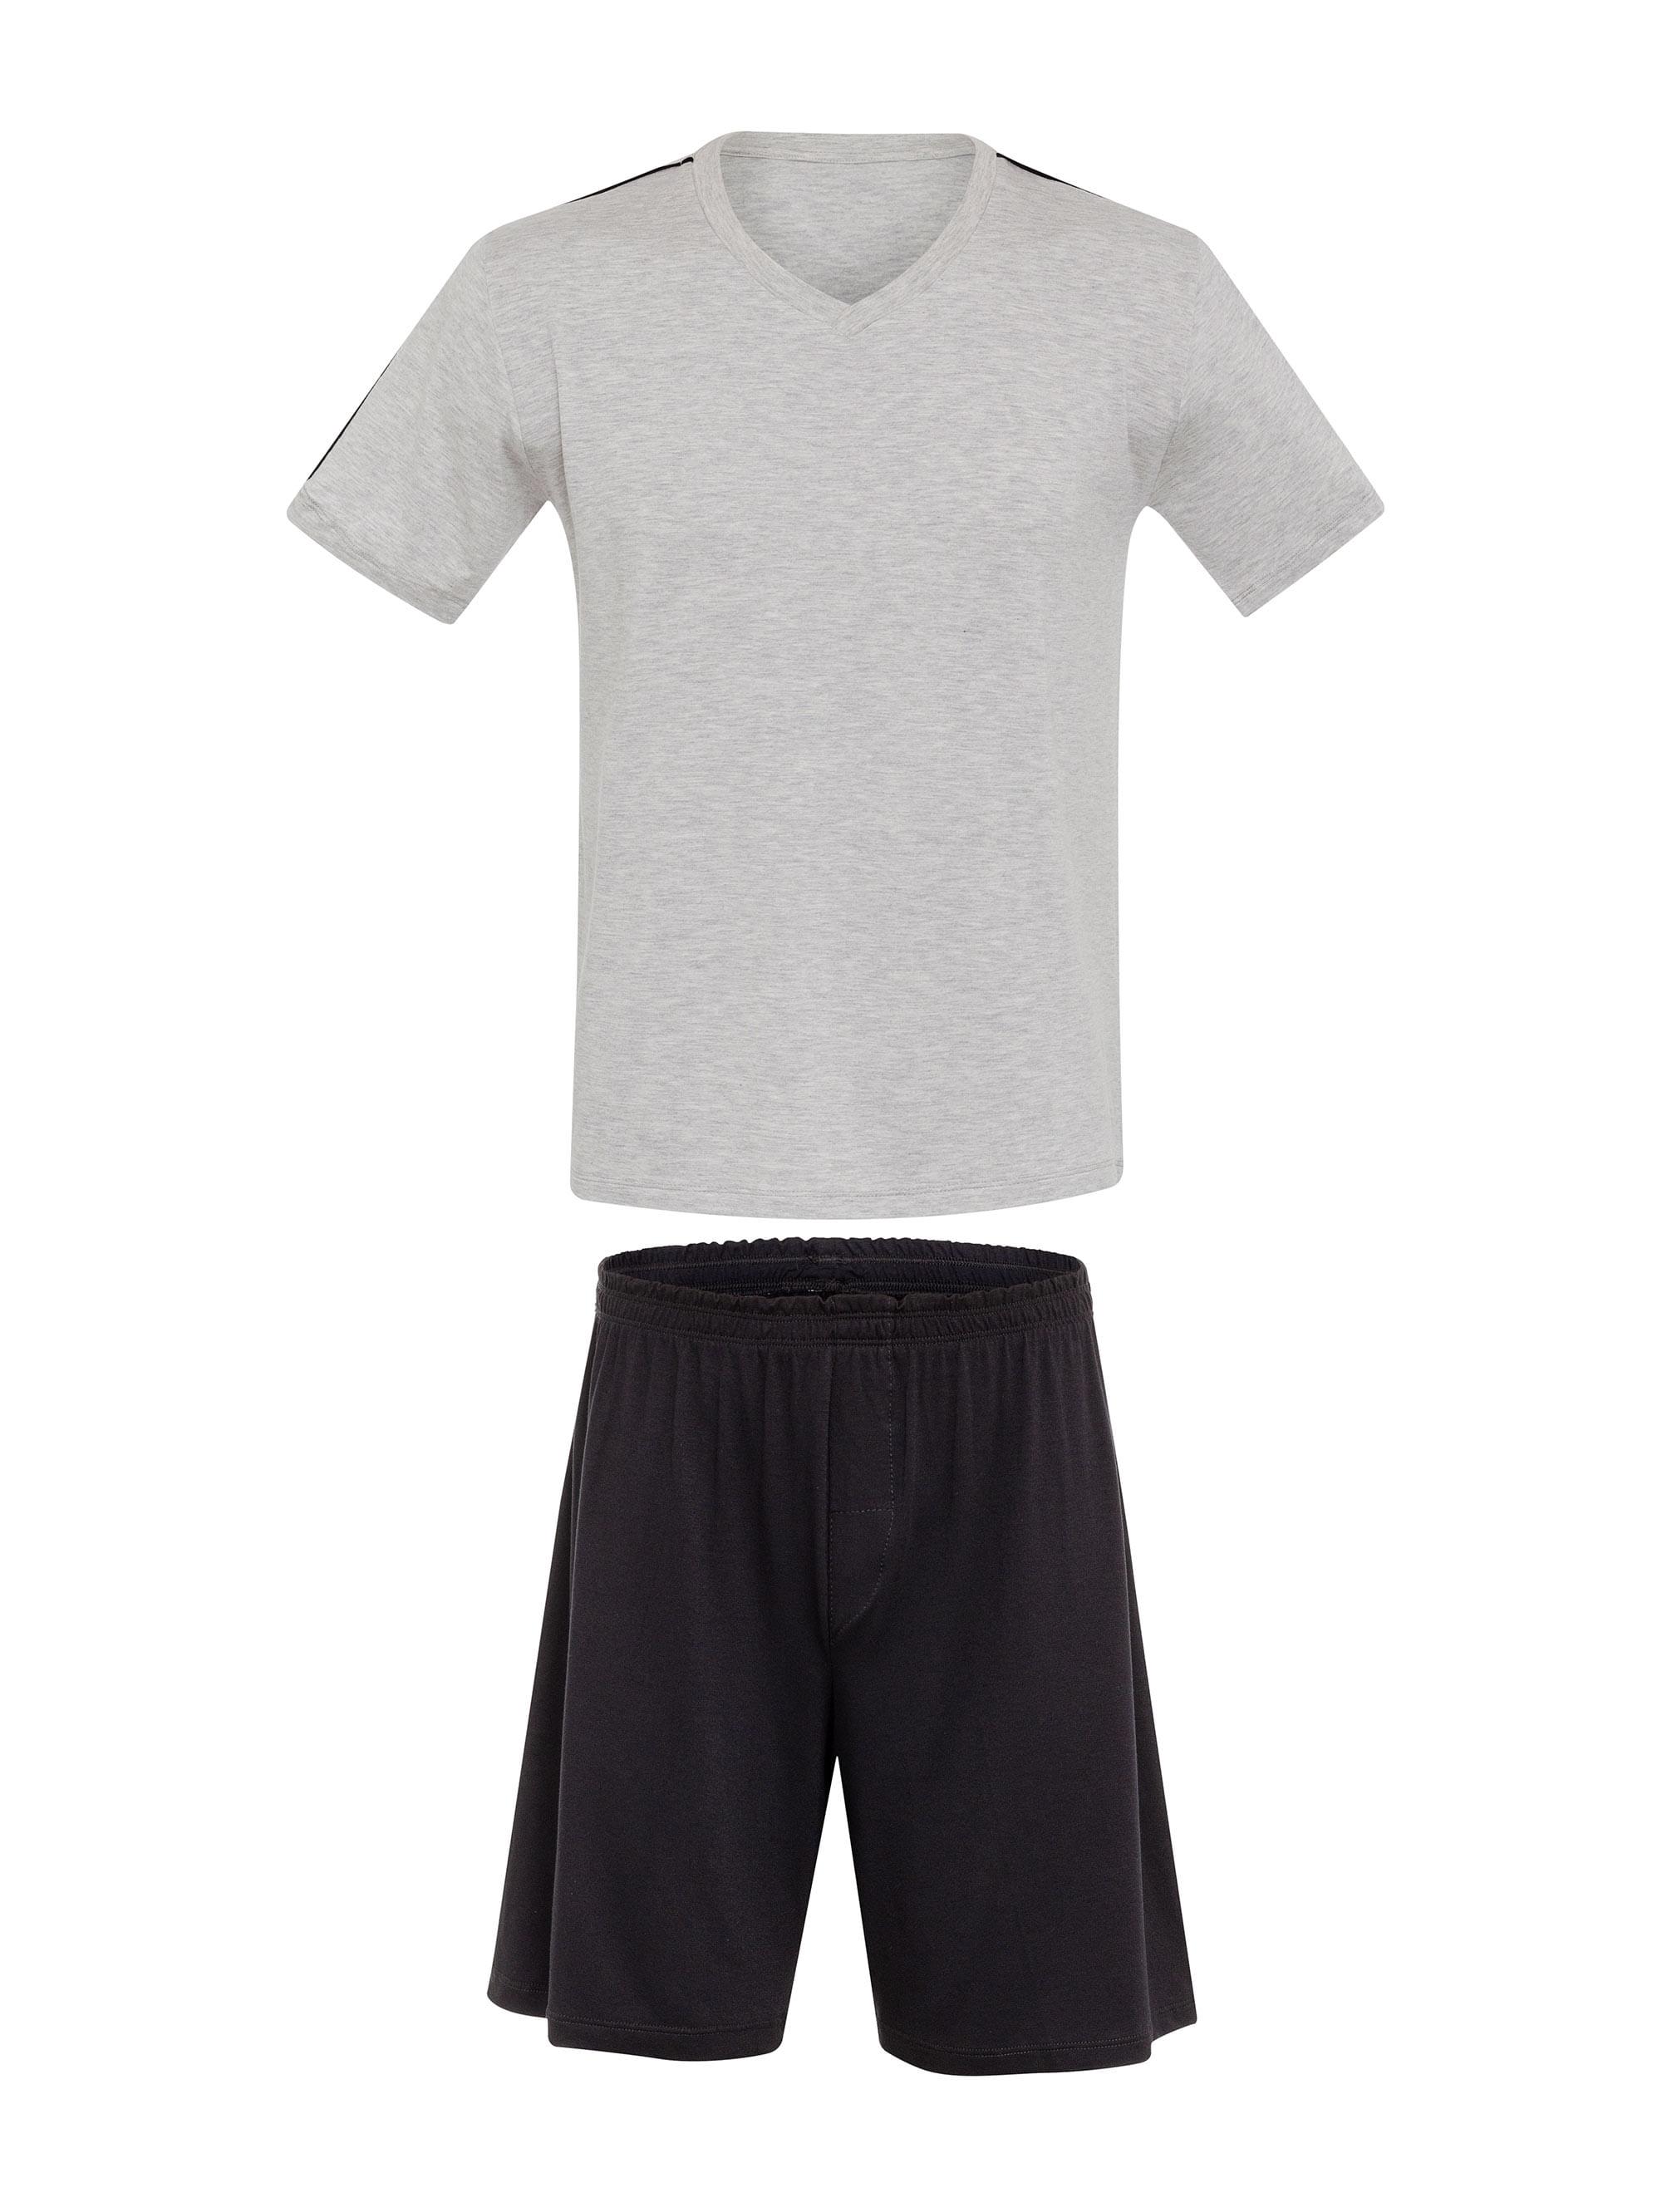 Pijama-Curto--Manga-Curta-Masculino--CAMARO-OUT---04.02.0770---02038